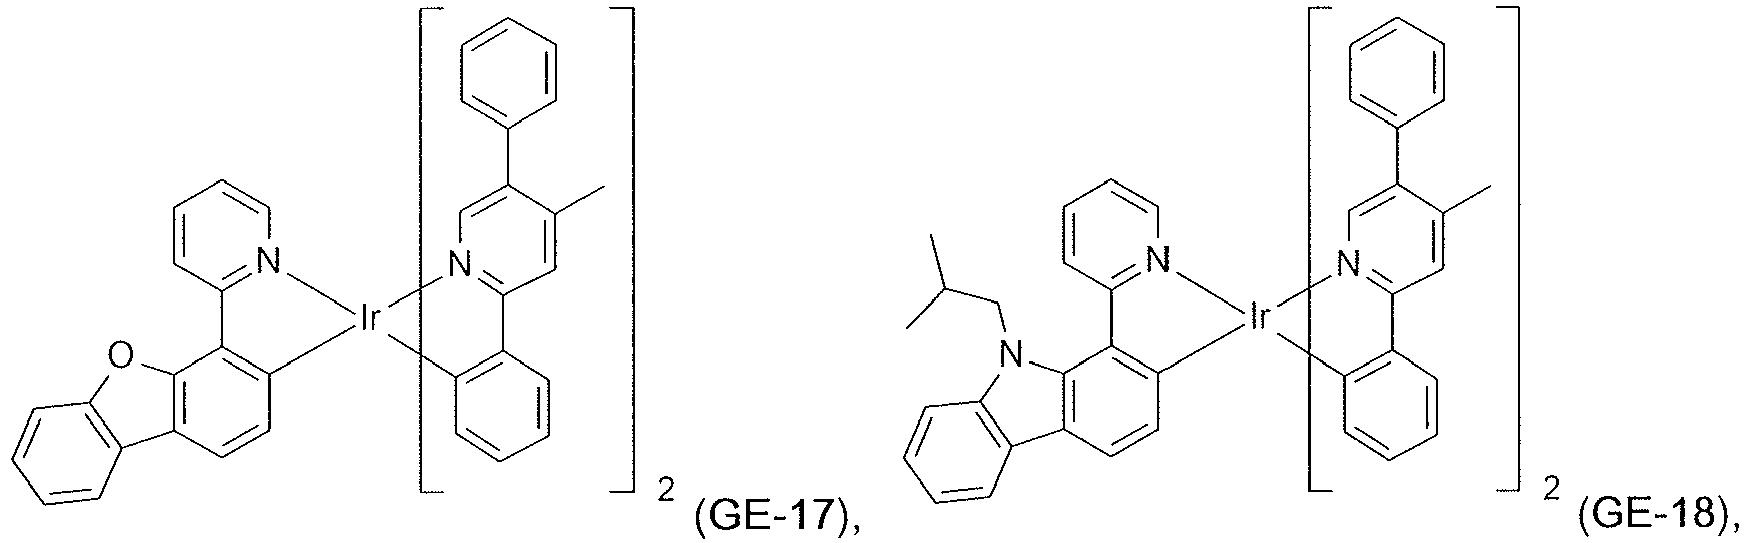 Figure imgb0657